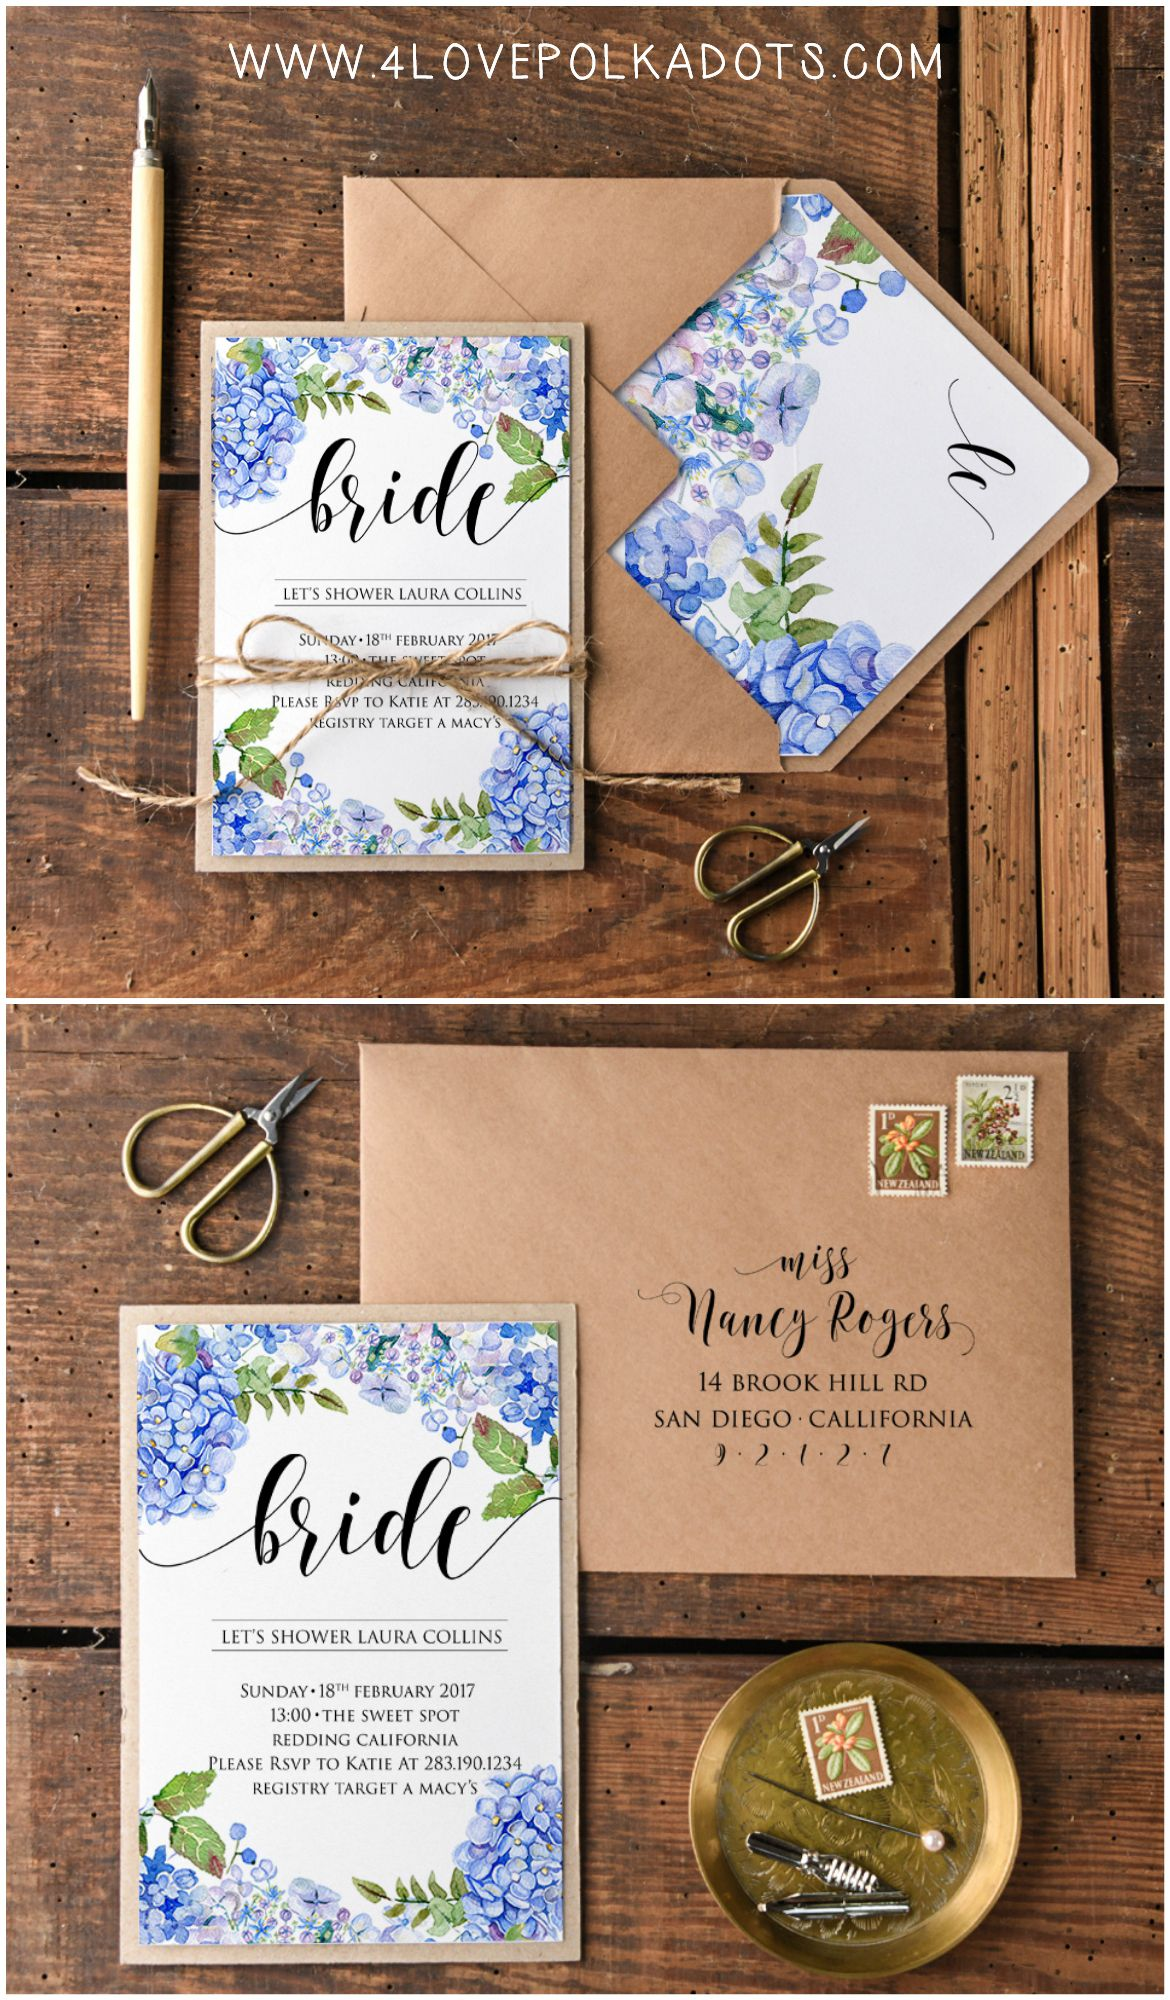 9cbb757503f8 Bridal Shower Wedding Invitations full of flowers  eco  ecofriendly  rustic   hydrangea  blue  bridetobe  bridalshower